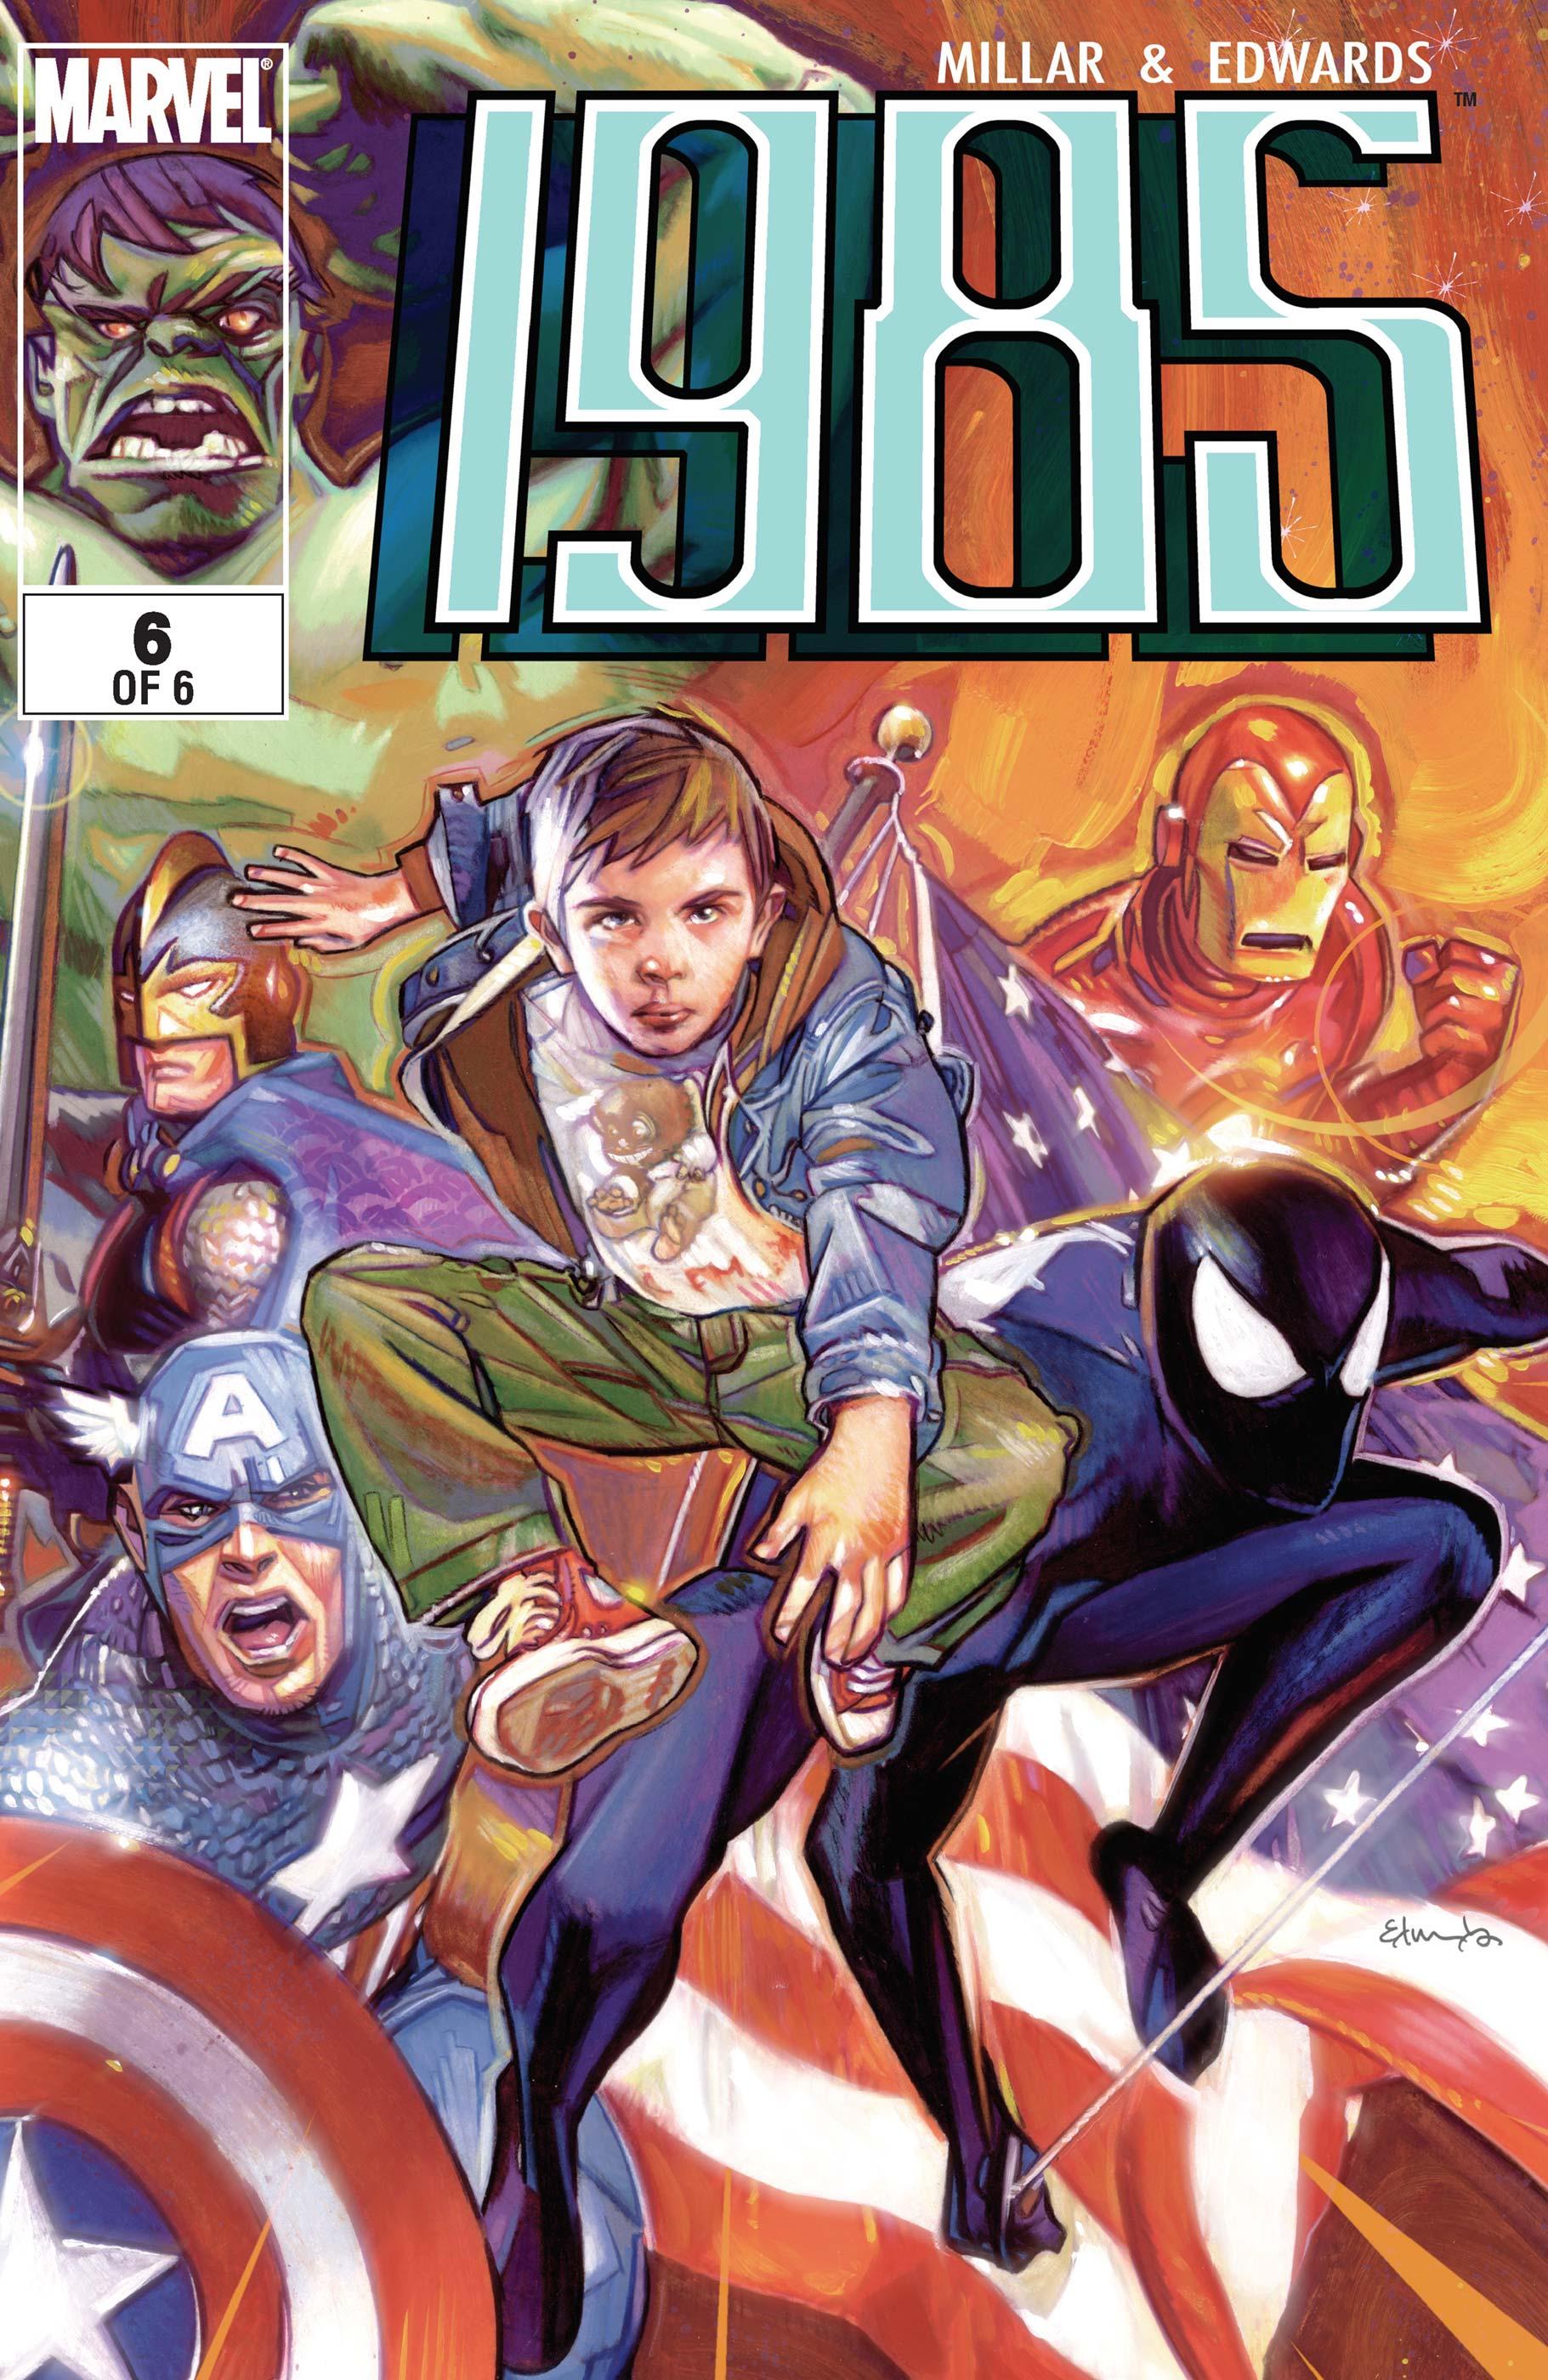 Marvel 1985 (2008) #6